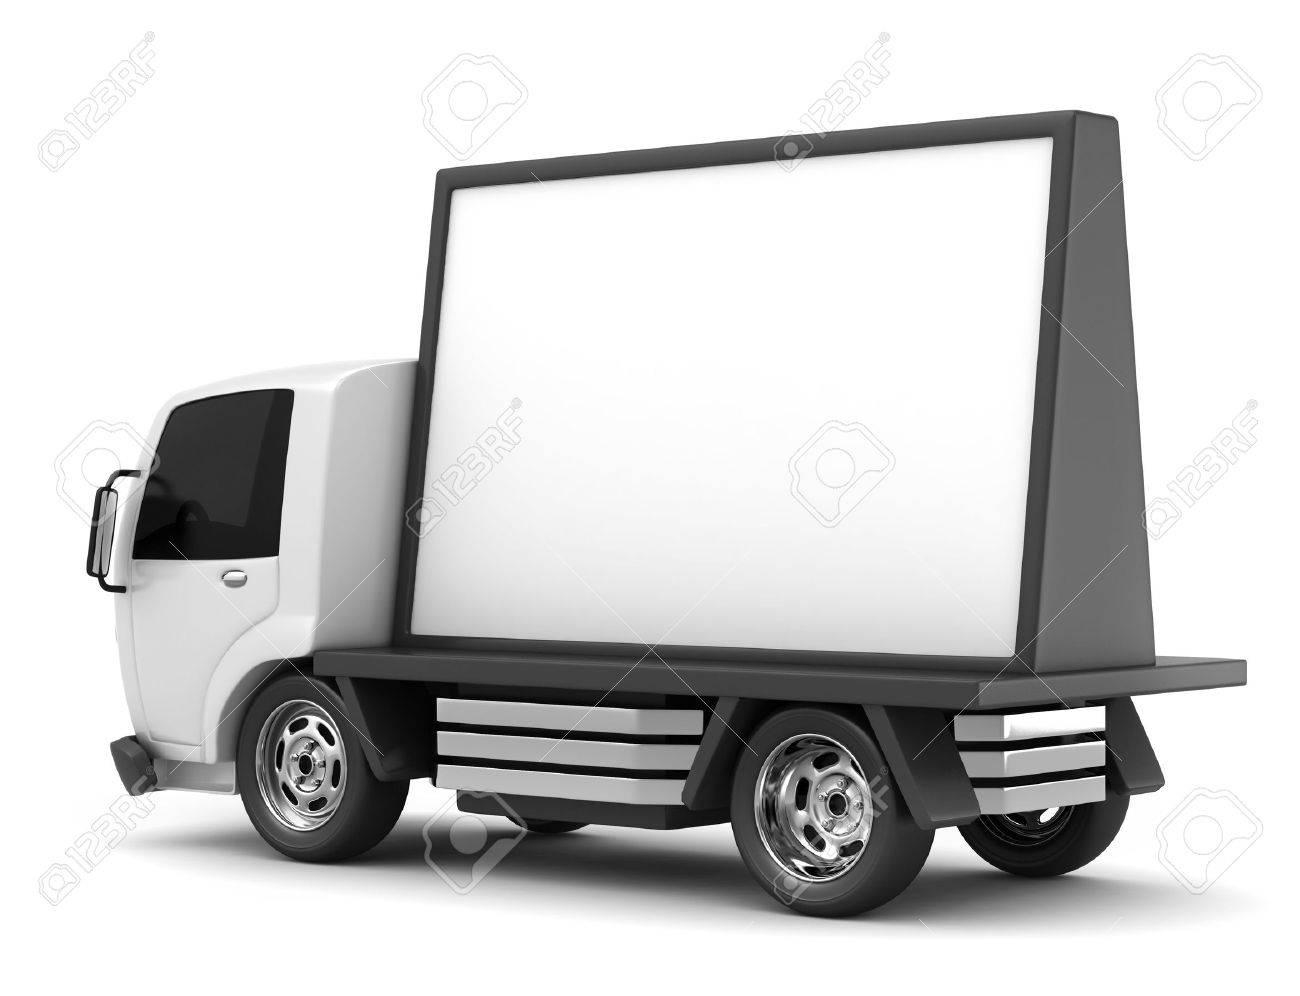 3D Illustration Of A Mobile Billboard Stock